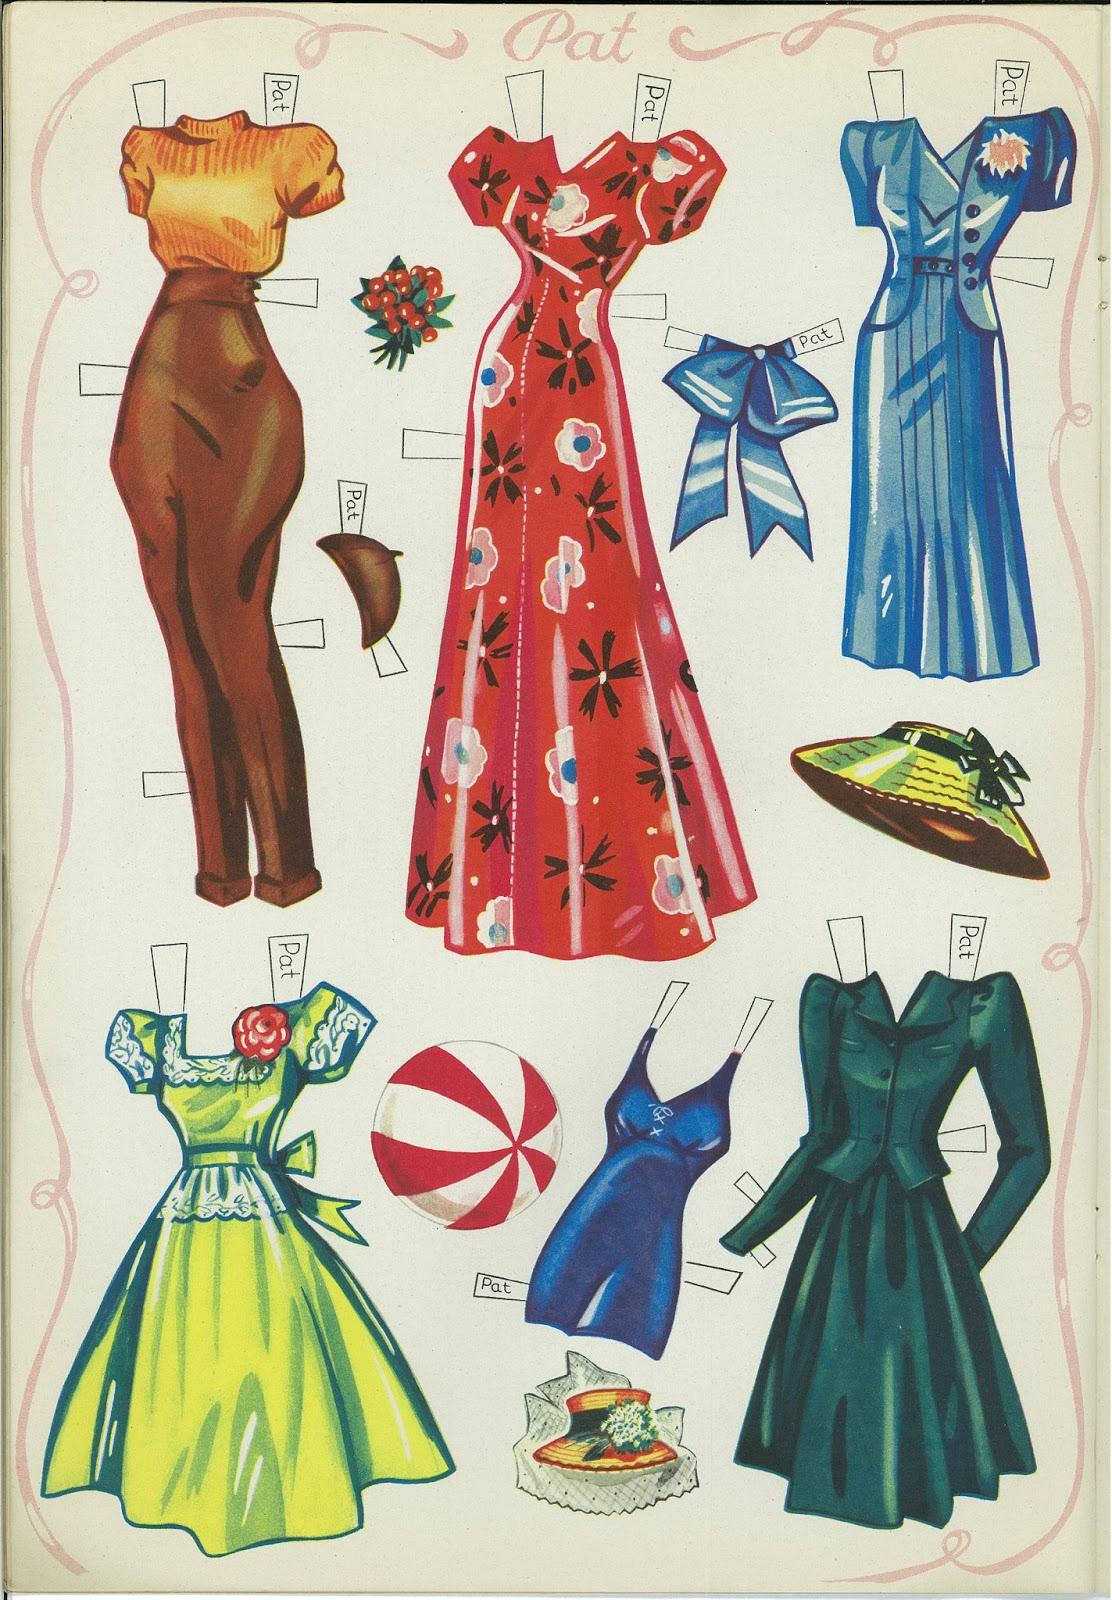 Miss Missy Paper Dolls: Paper dolls on Parade